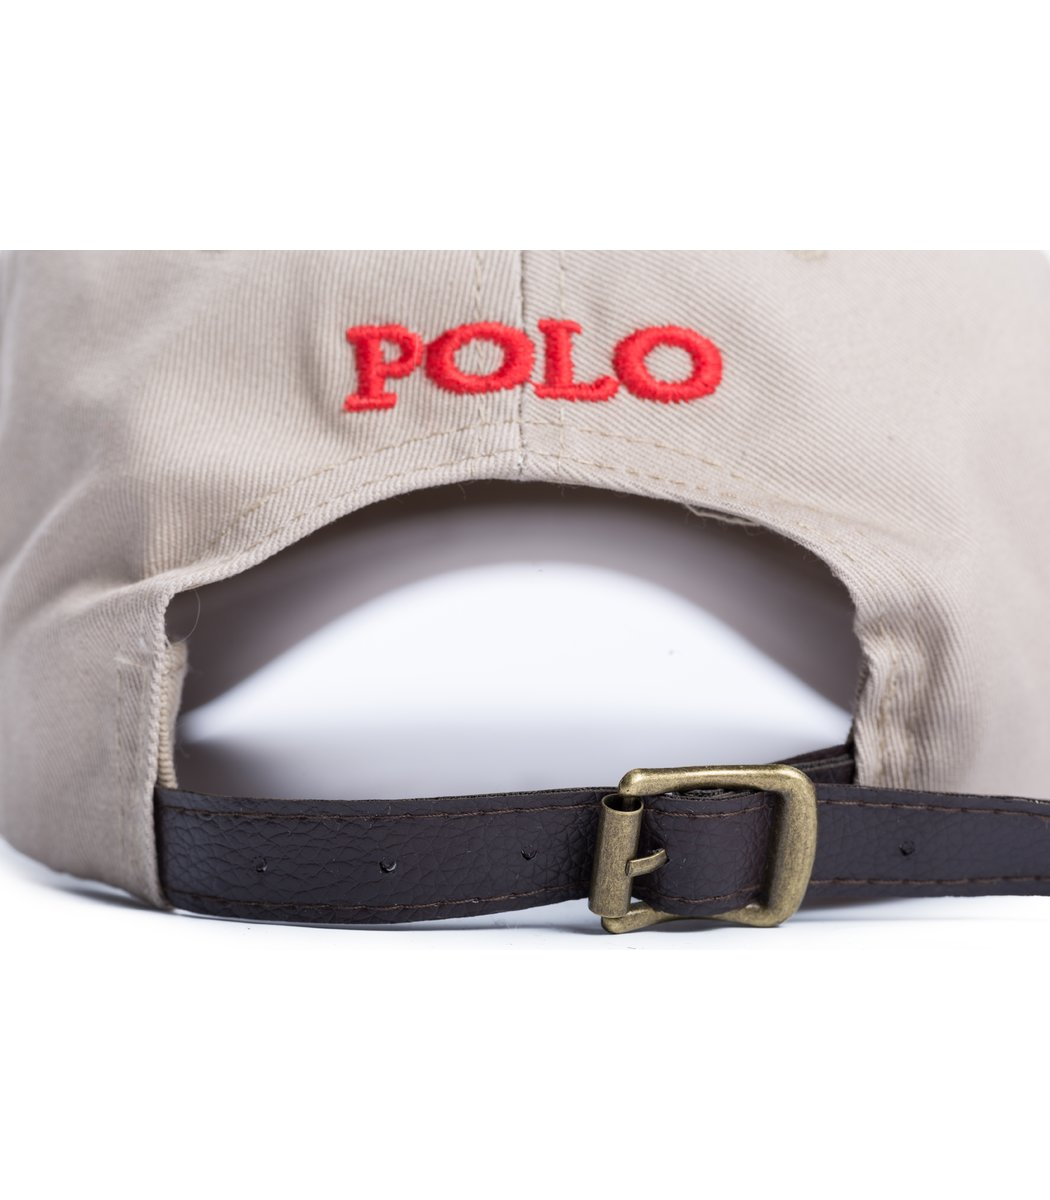 Кепка POLO Ralph Lauren Premiere Бежевый/красный - Бежевый - Вид 3